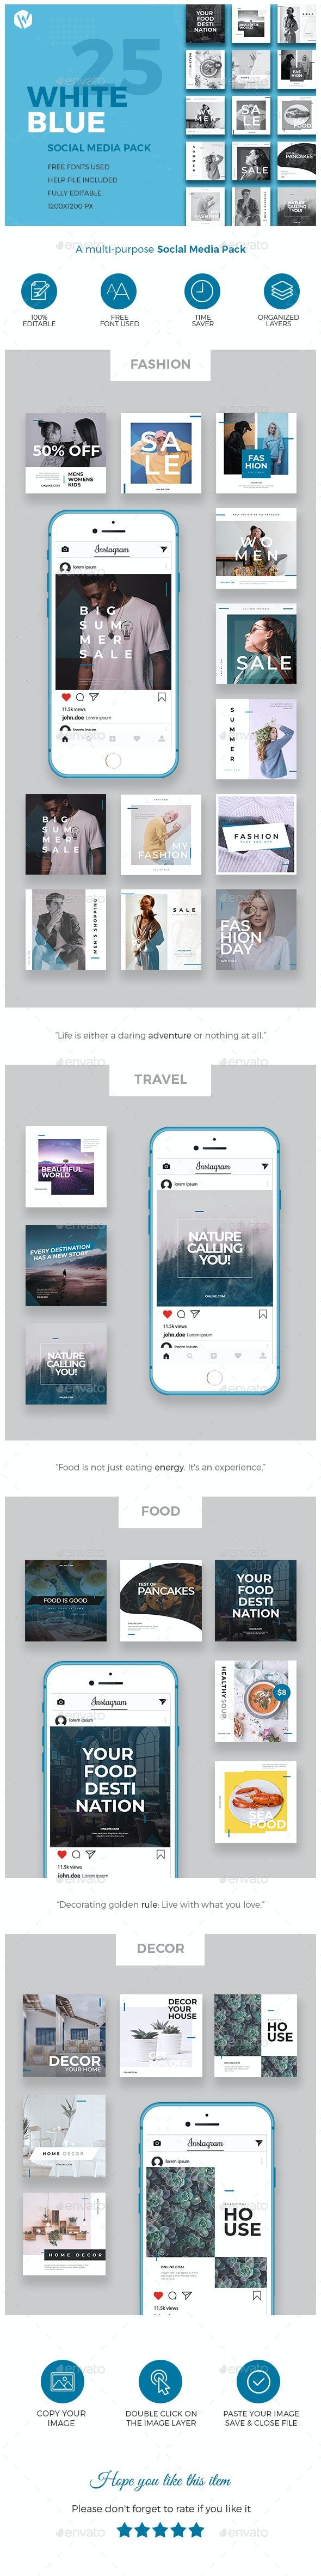 25 Instagram Blue & White Banners - Multi-purpose Social Media Pack - Social Media Web Elements